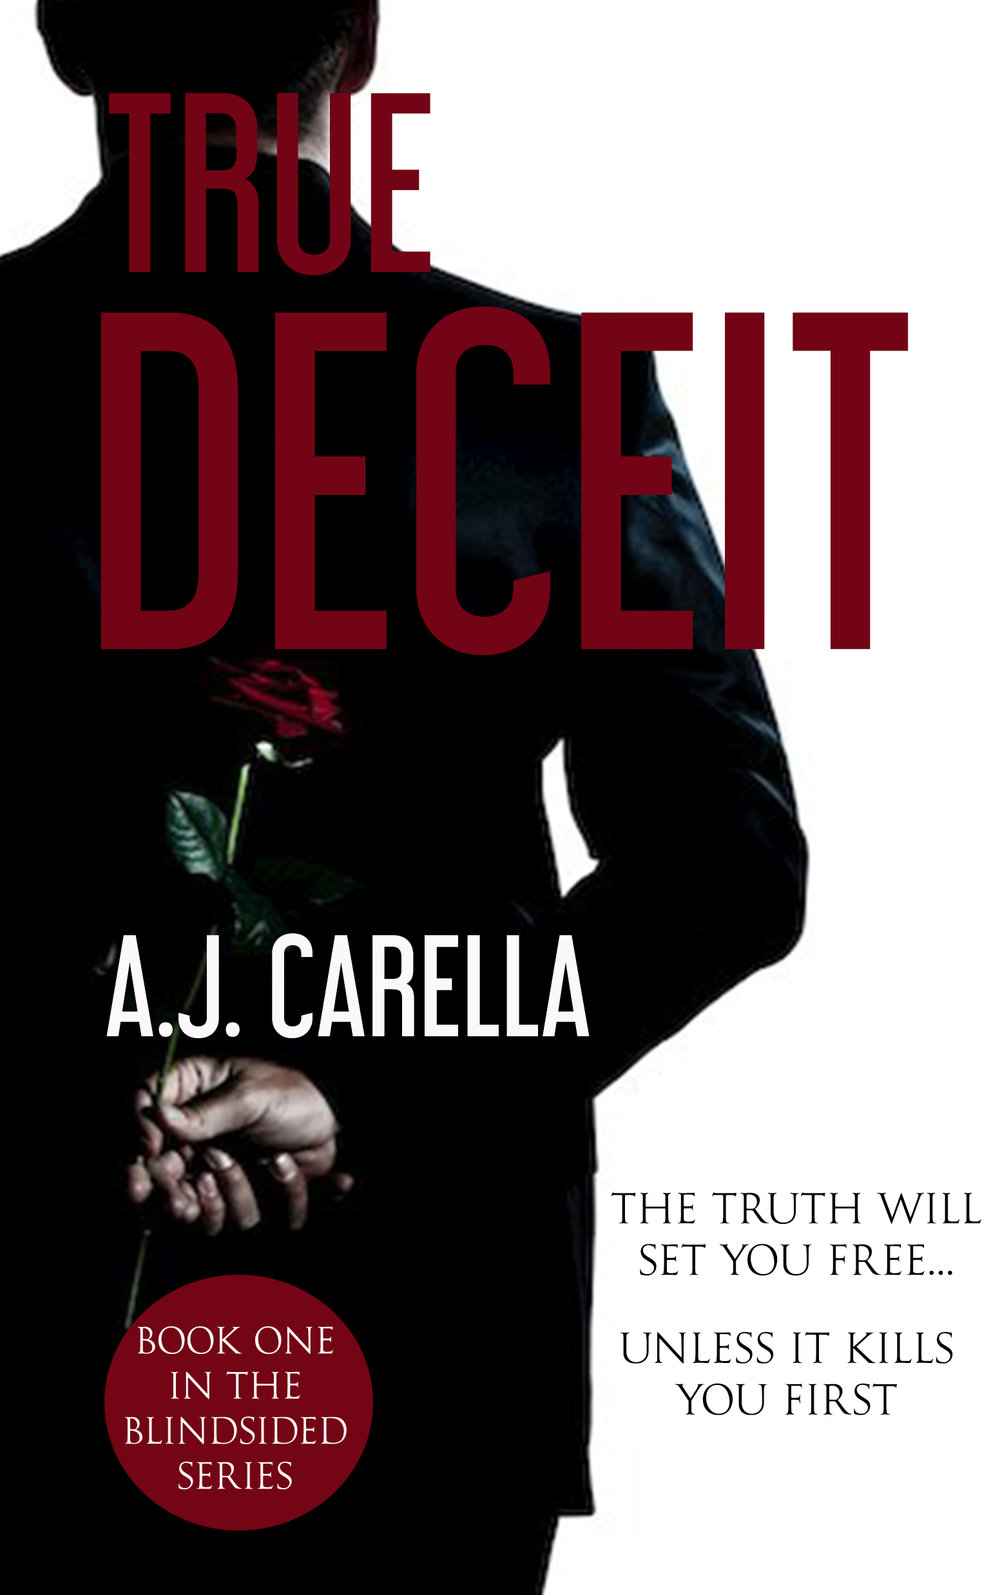 A dead wife. An underworld organization. A secret that threatens them all.